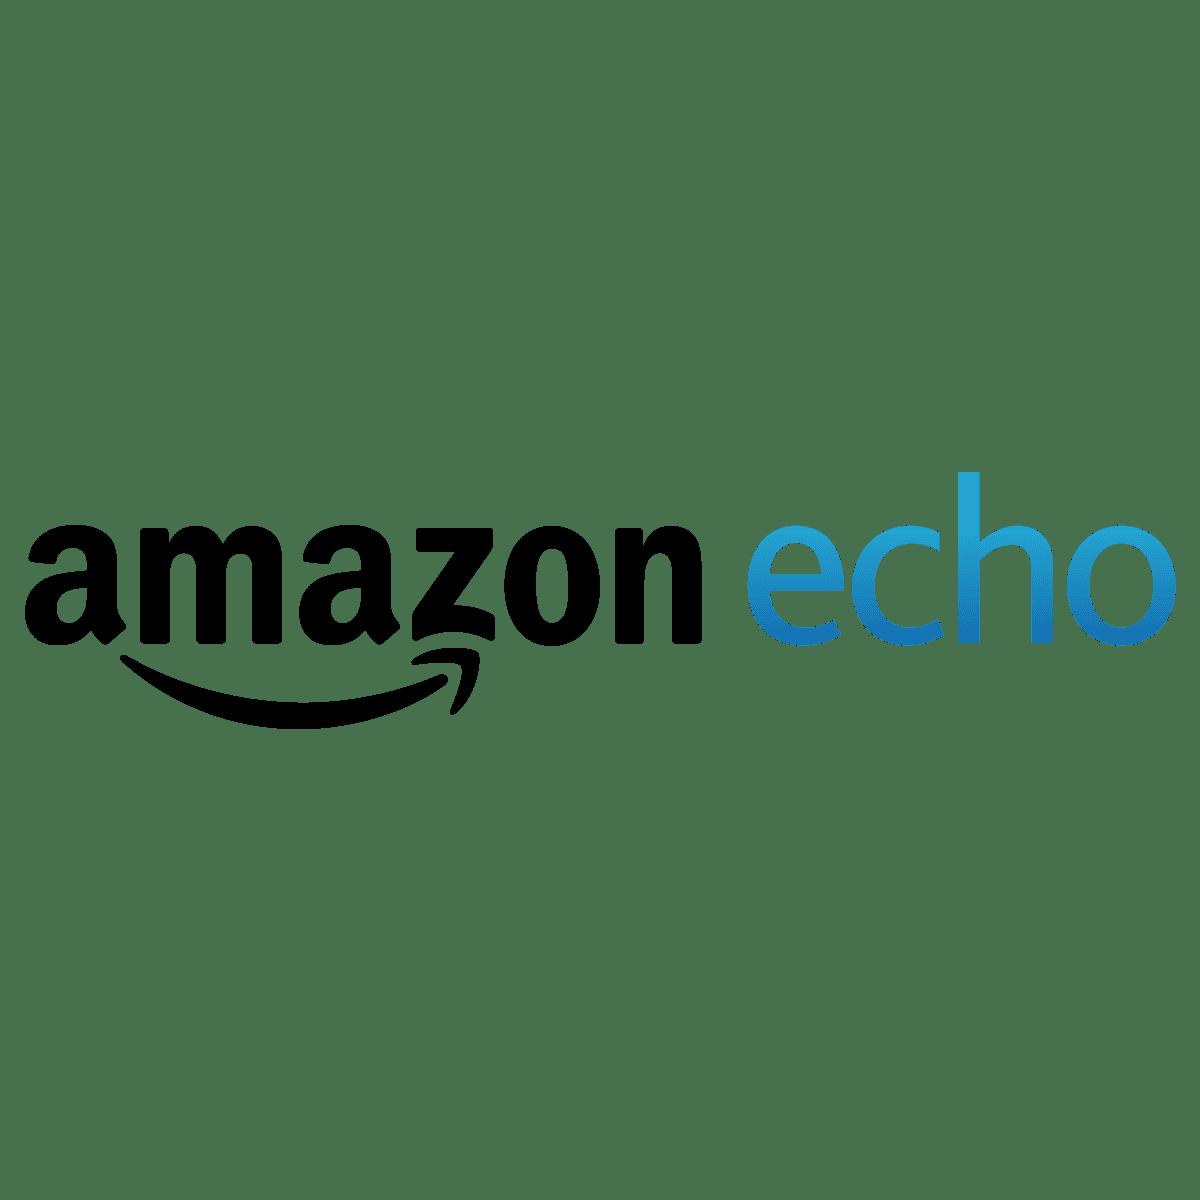 96a1553a3d85c33545da3330d1401731_logo-png-amazon-echo-logo_1200-1200